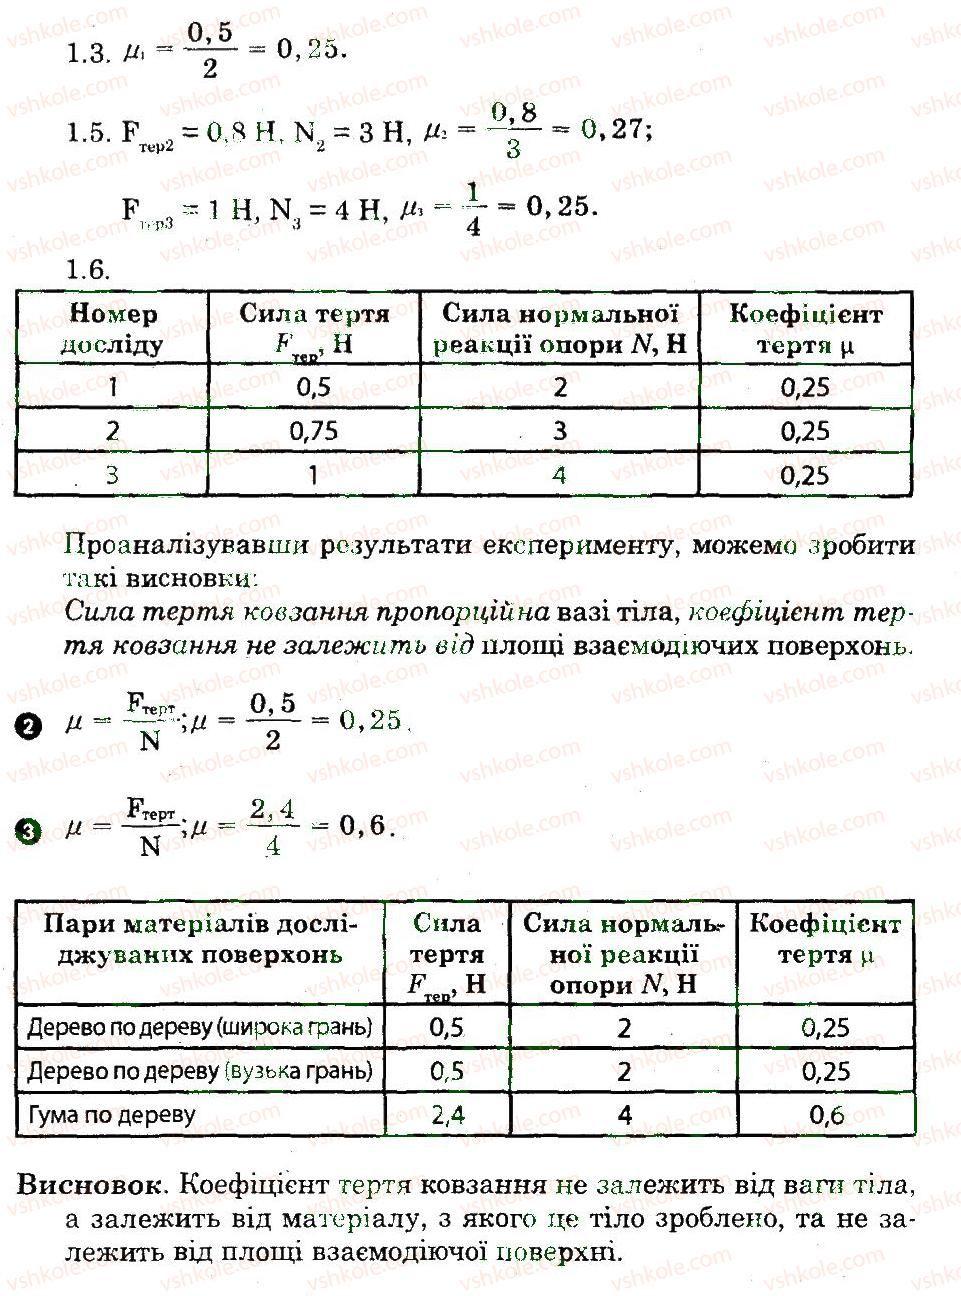 8-fizika-fya-bozhinova-oo-kiryuhina-2010-zoshit-dlya-laboratornih-robit--laboratorni-roboti-7-rnd824.jpg